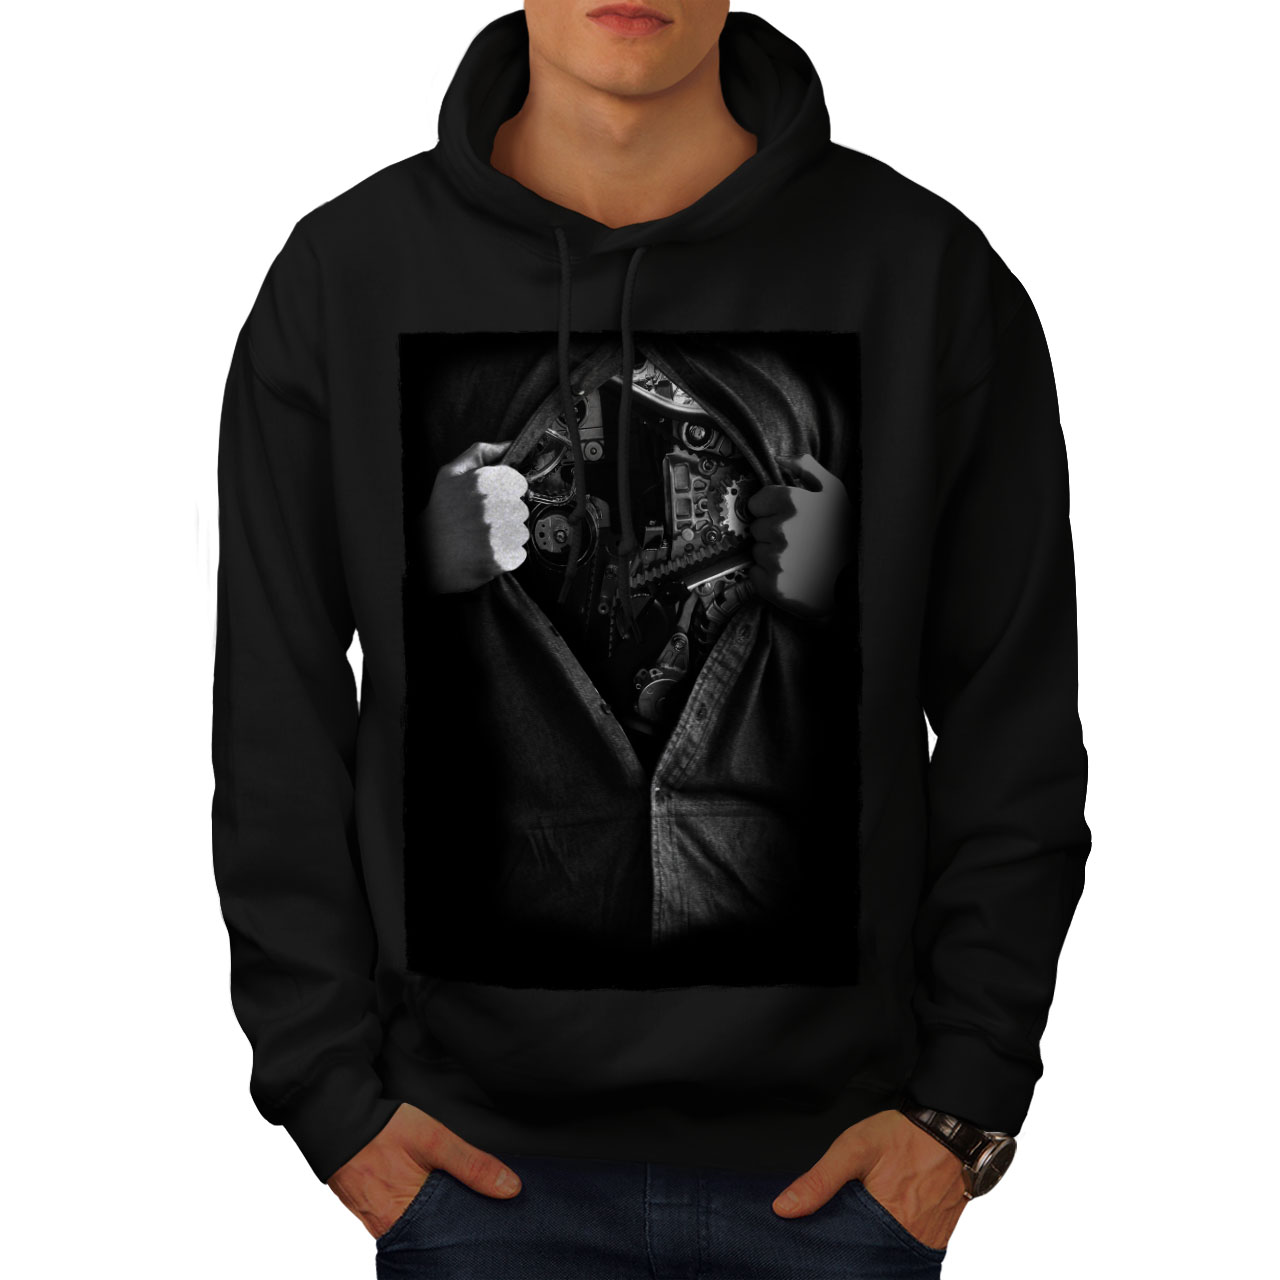 wellcoda Heart Music Mens Sweatshirt Soul Beat Casual Jumper